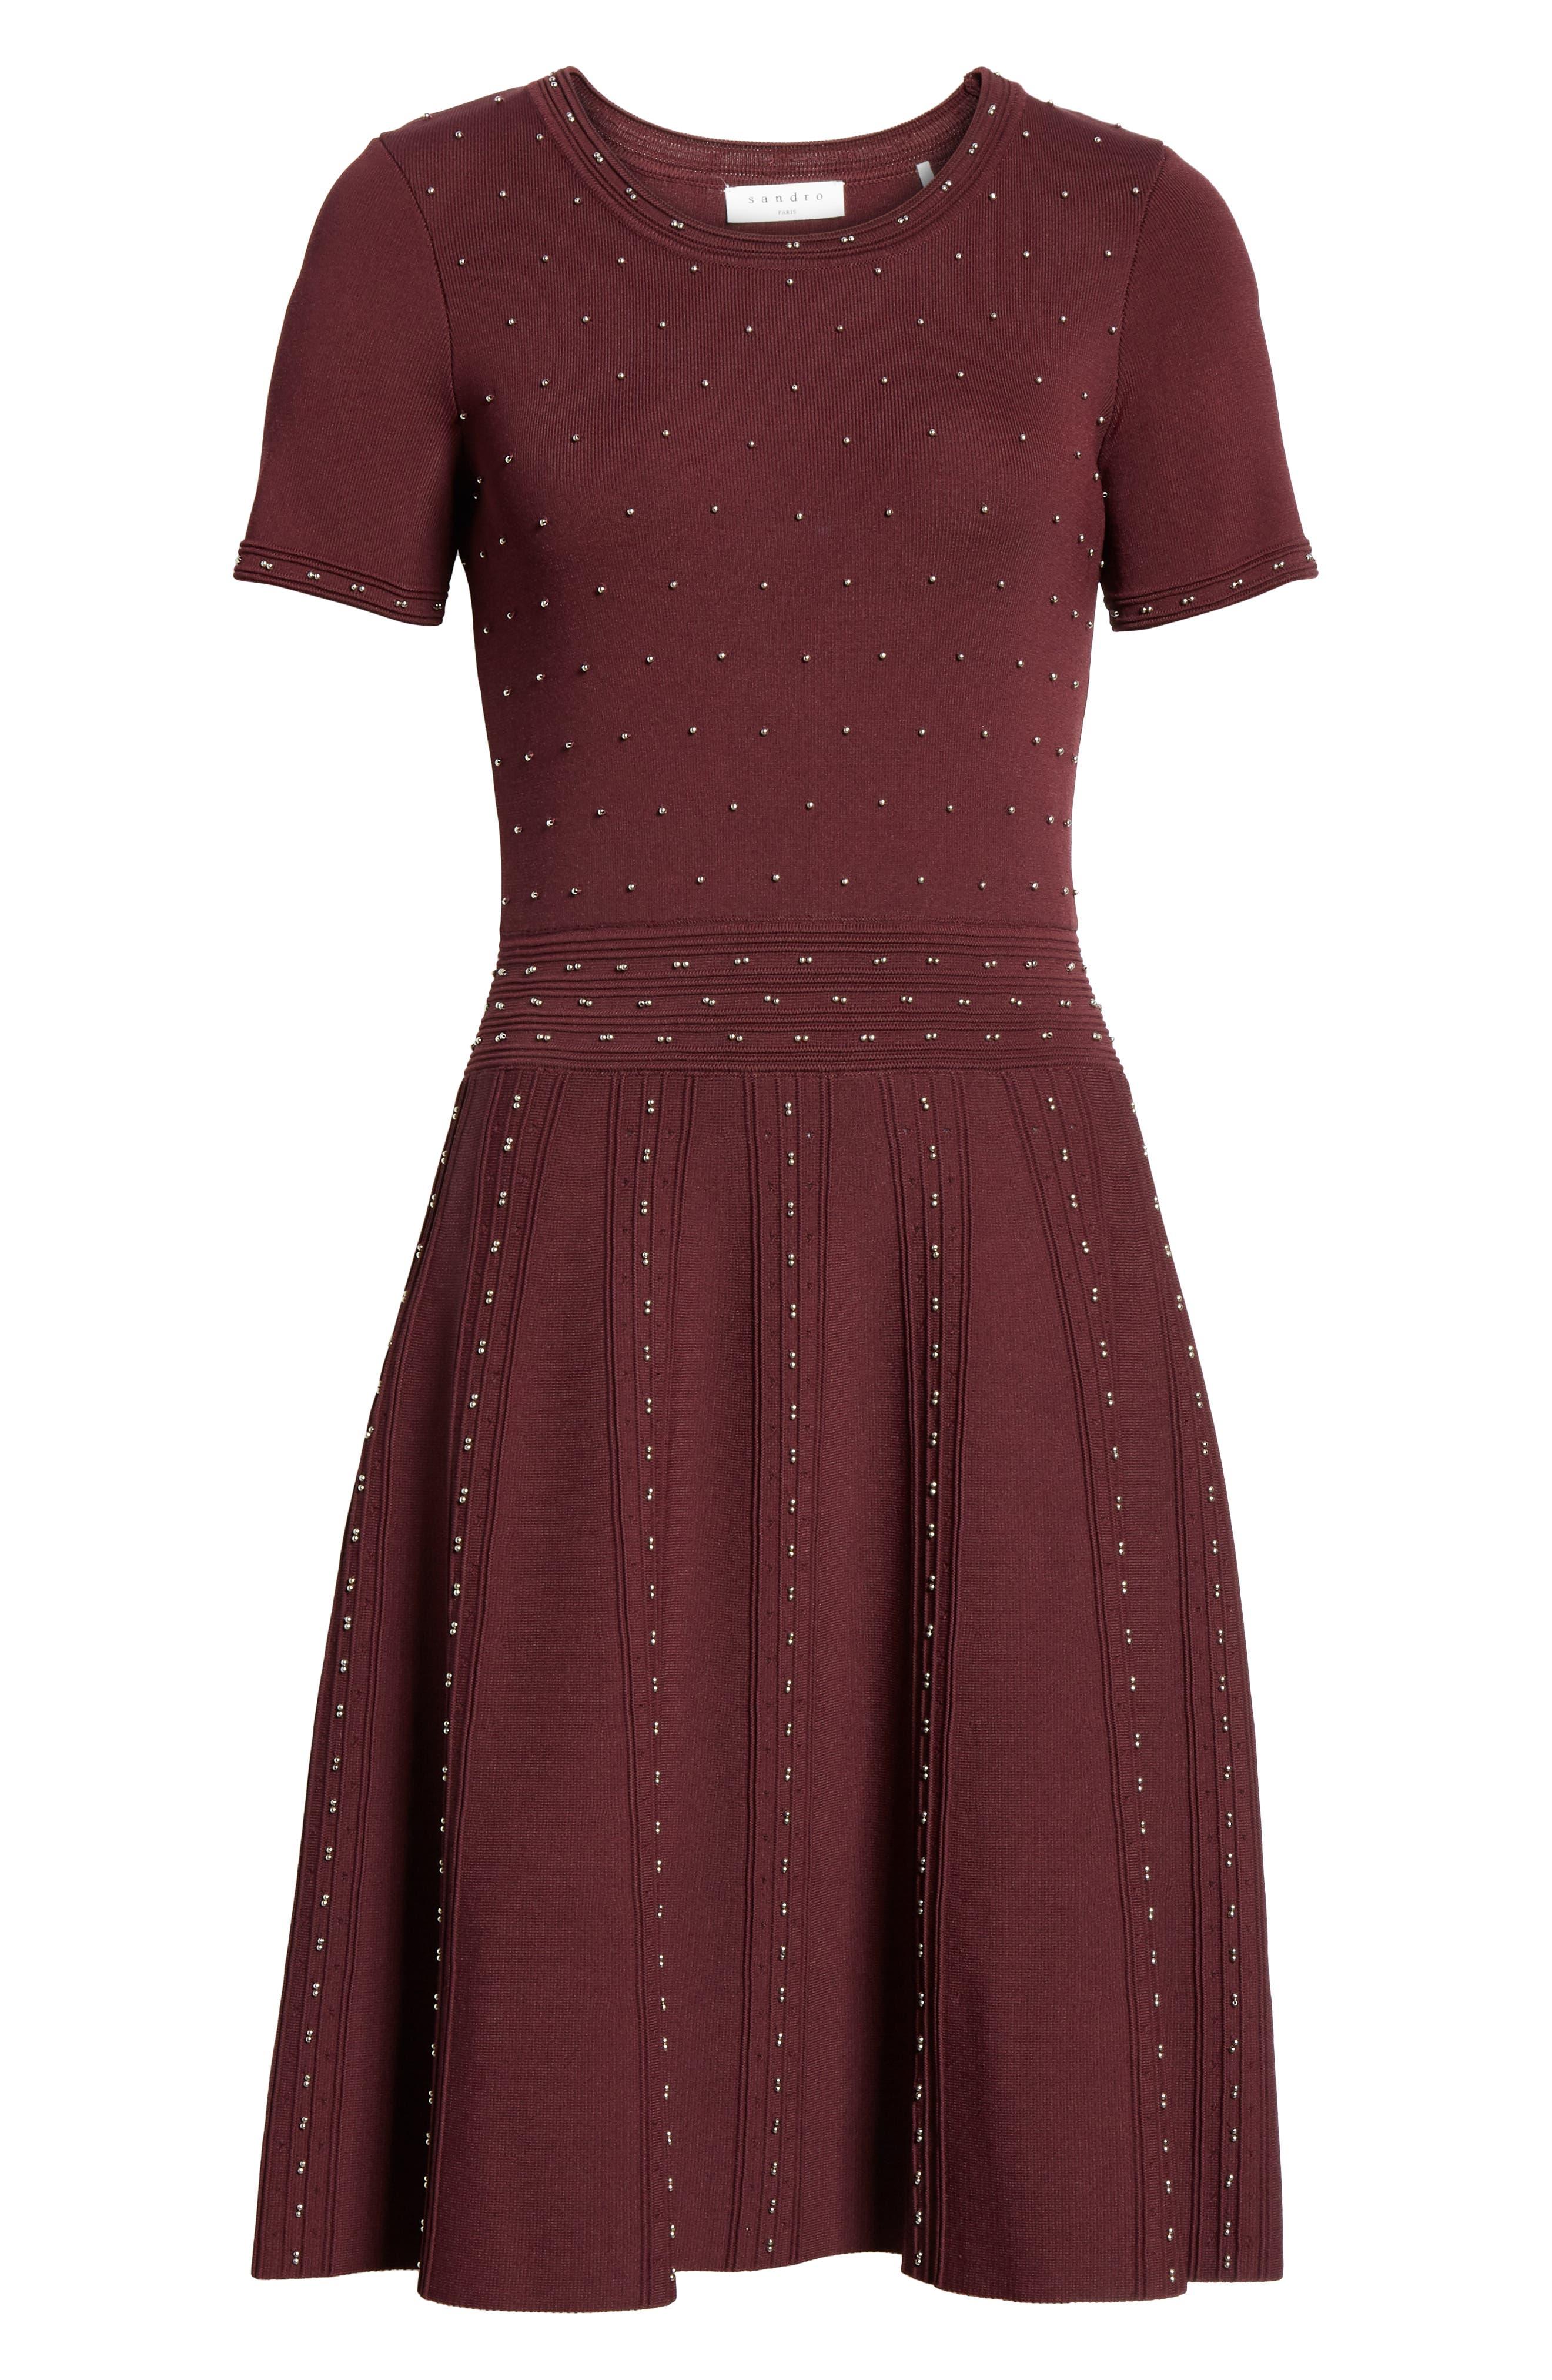 Montaigne Metallic Bead Fit & Flare Dress,                             Alternate thumbnail 6, color,                             613